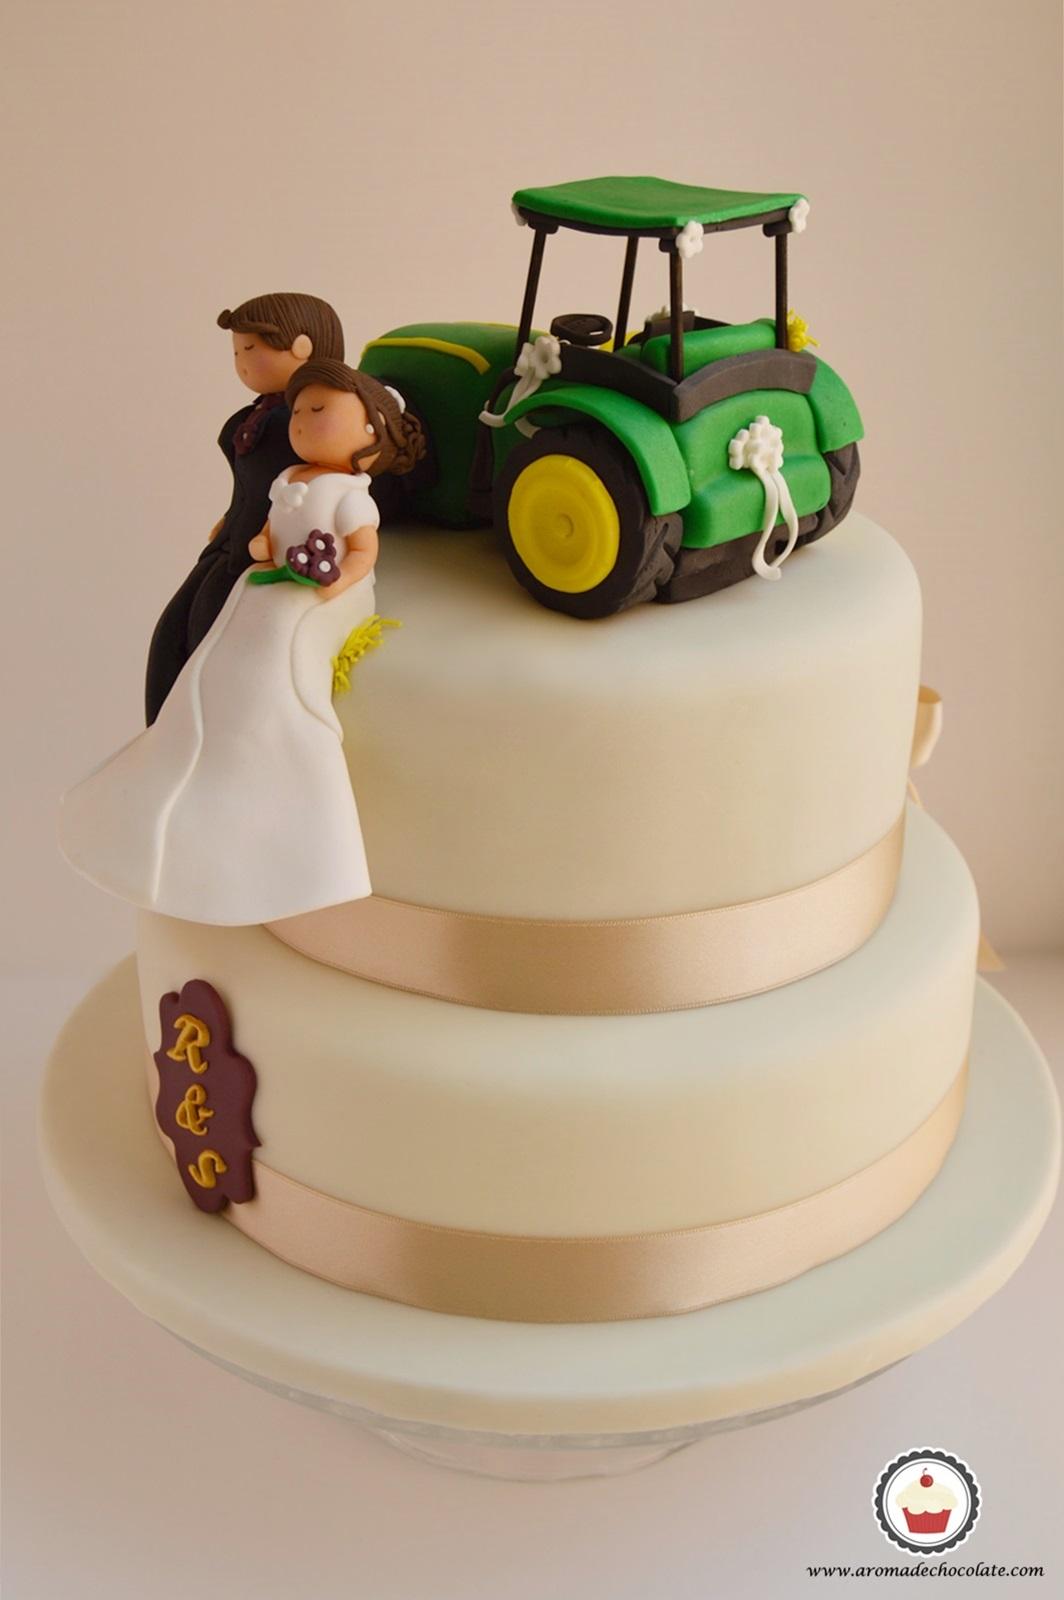 Tarta Nupcial. Trasera tractor. Aroma de chocolate